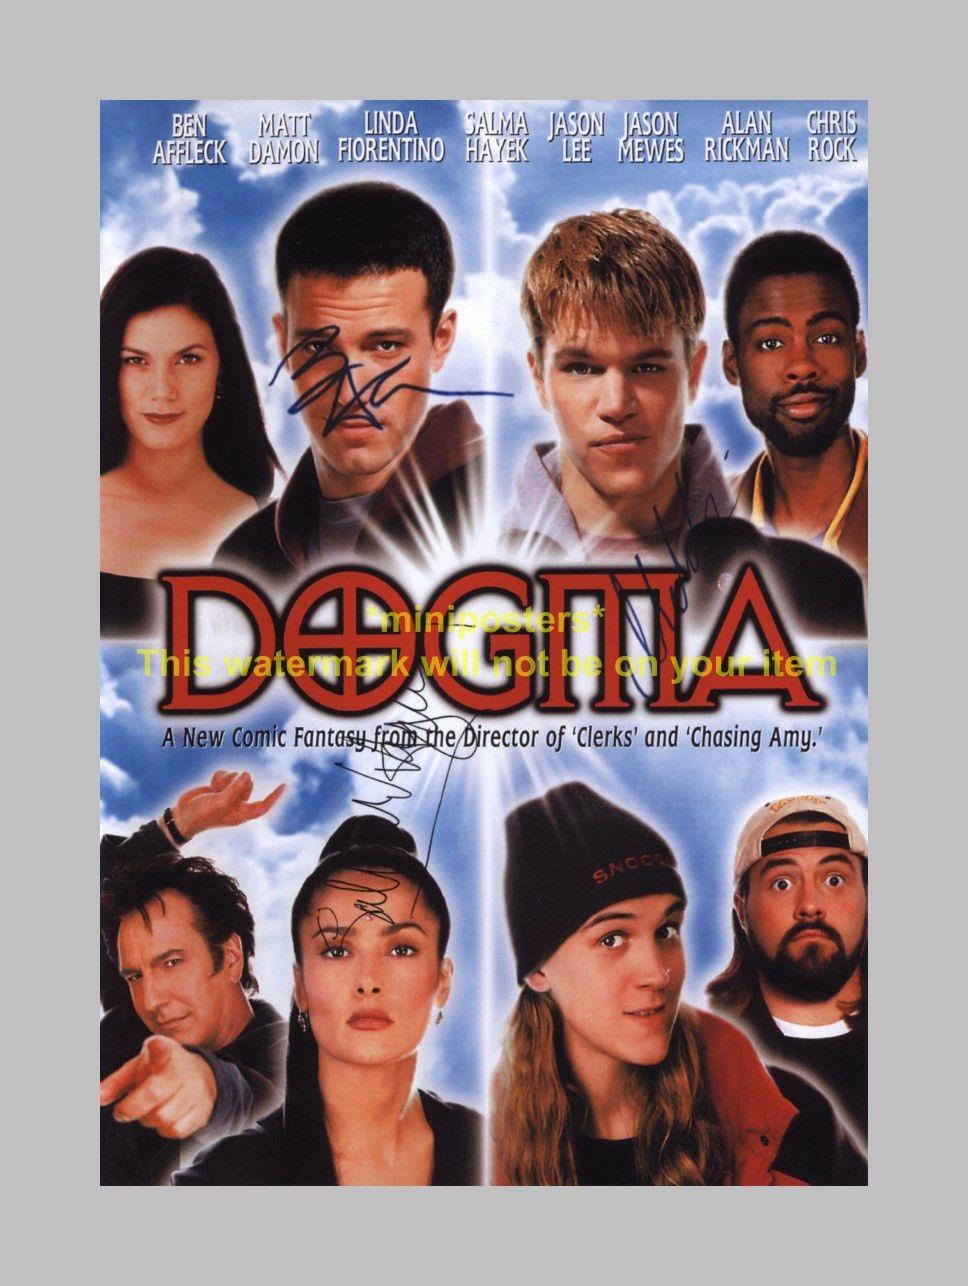 449 Gbp Dogma Cast X3 Pp Signed Poster 12x8 Damon Affleck Ebay